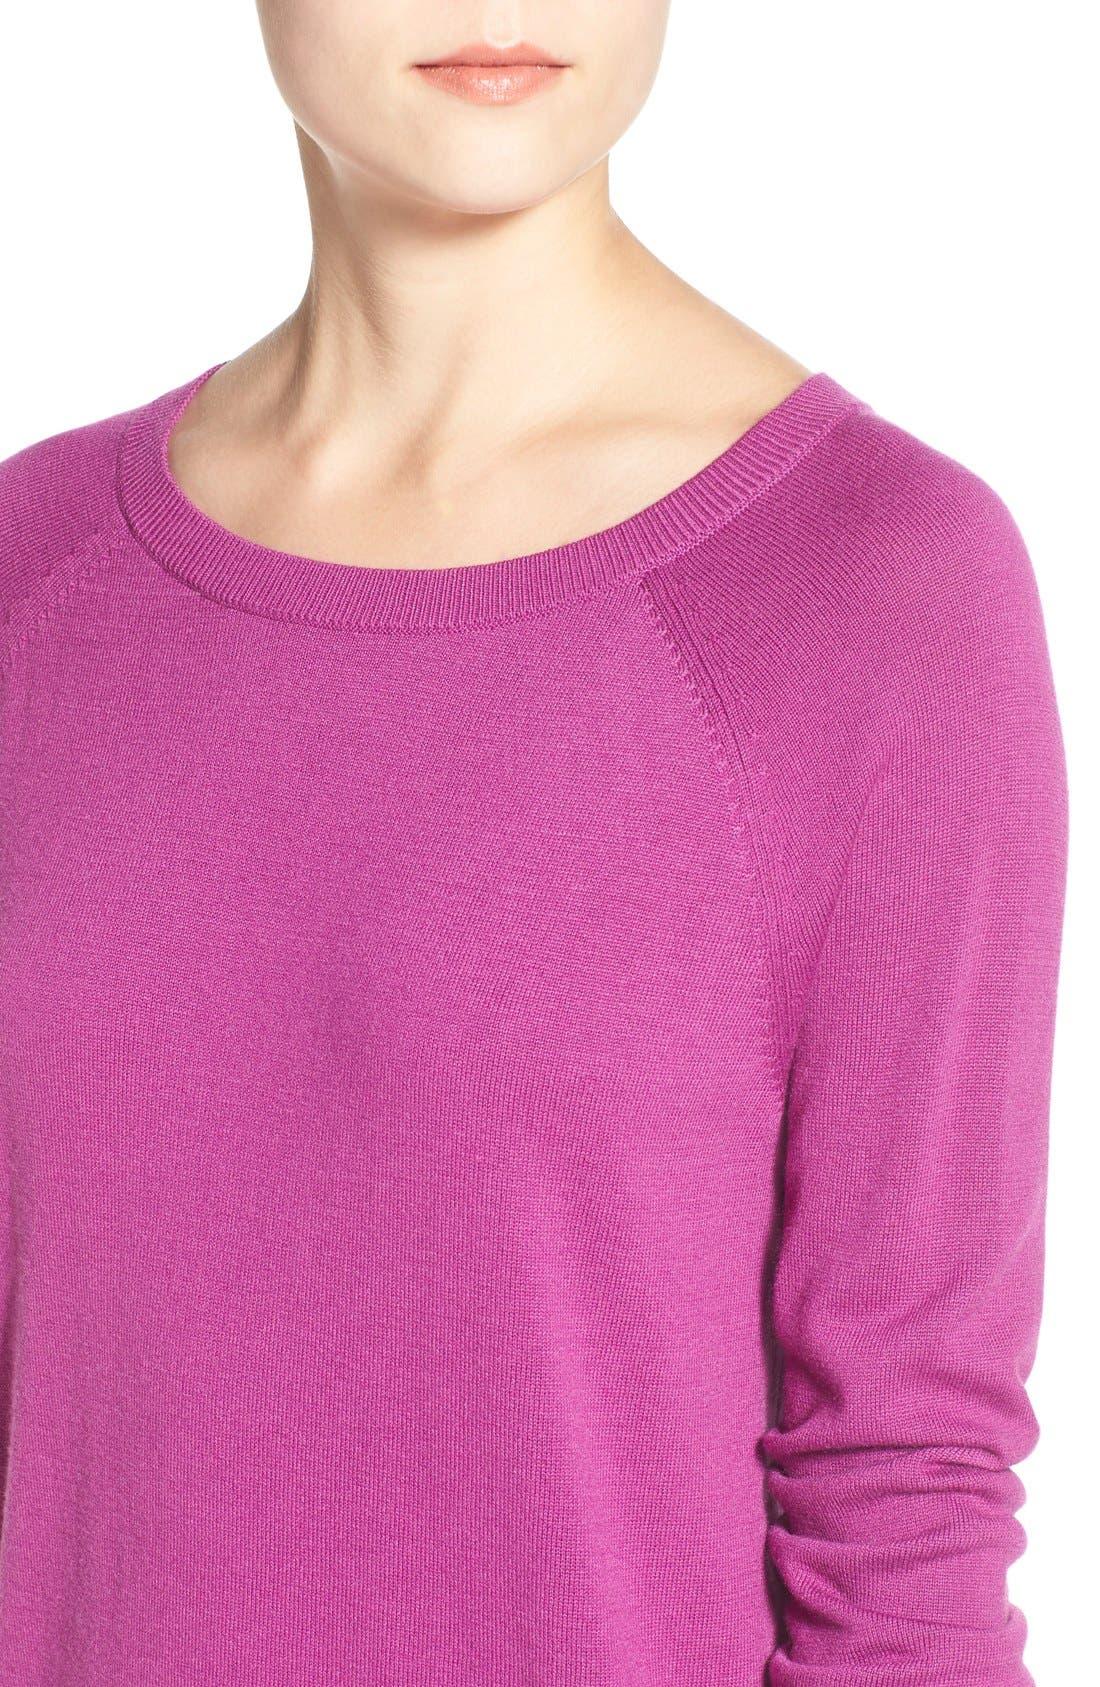 Raglan Crewneck Sweater,                             Alternate thumbnail 6, color,                             510